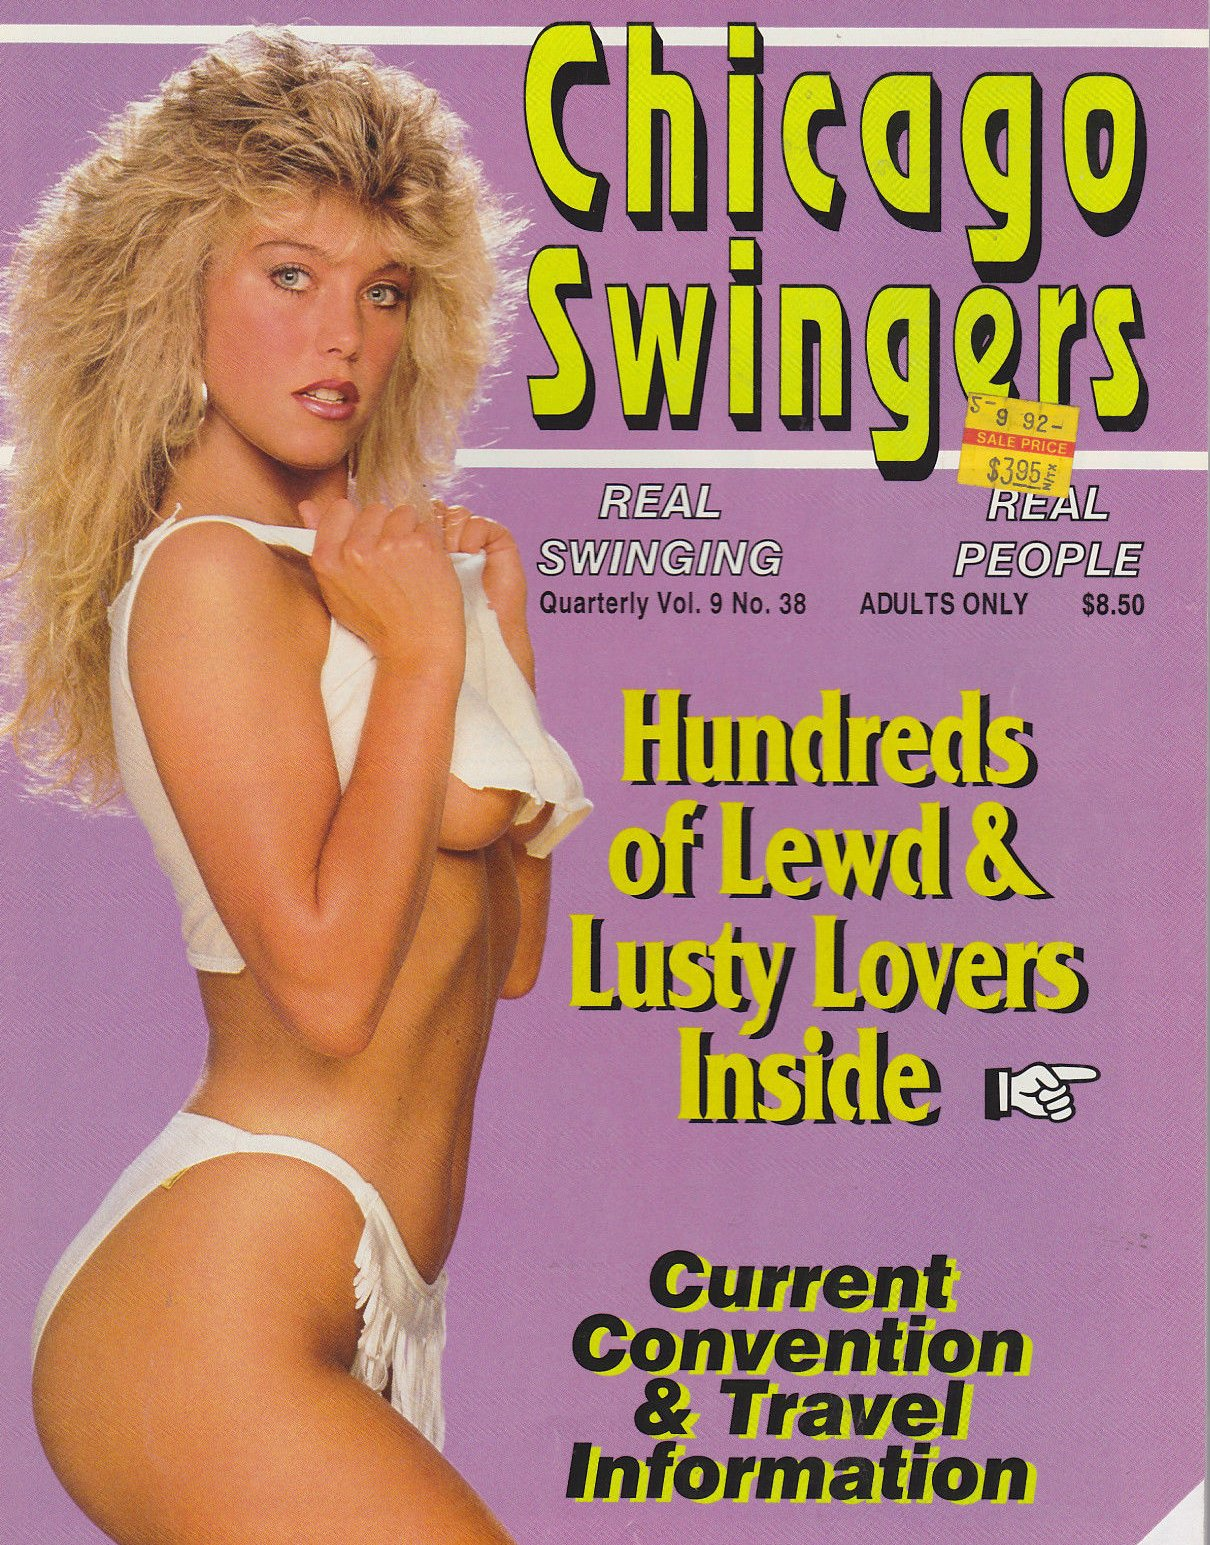 Chicago swingers magazine Being Single Magazine Online